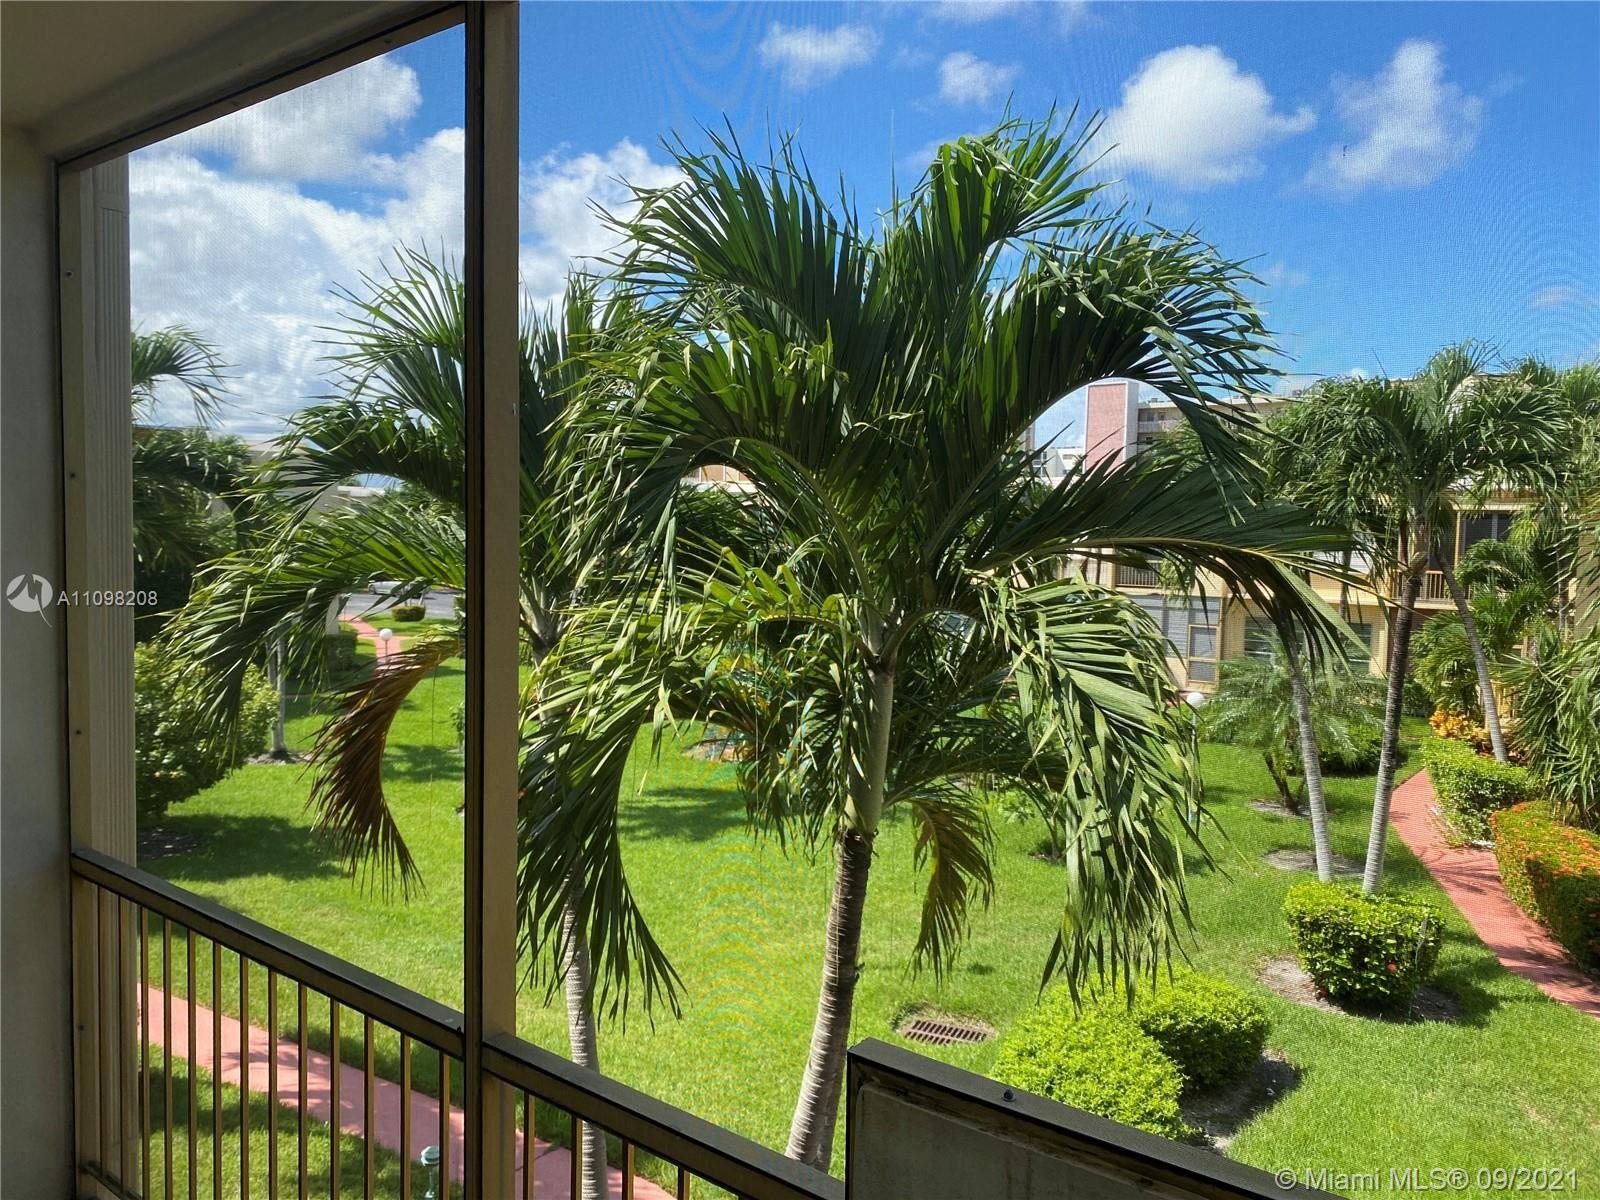 851 NE 14th Ave #413, Hallandale Beach, FL 33009 - #: A11098208